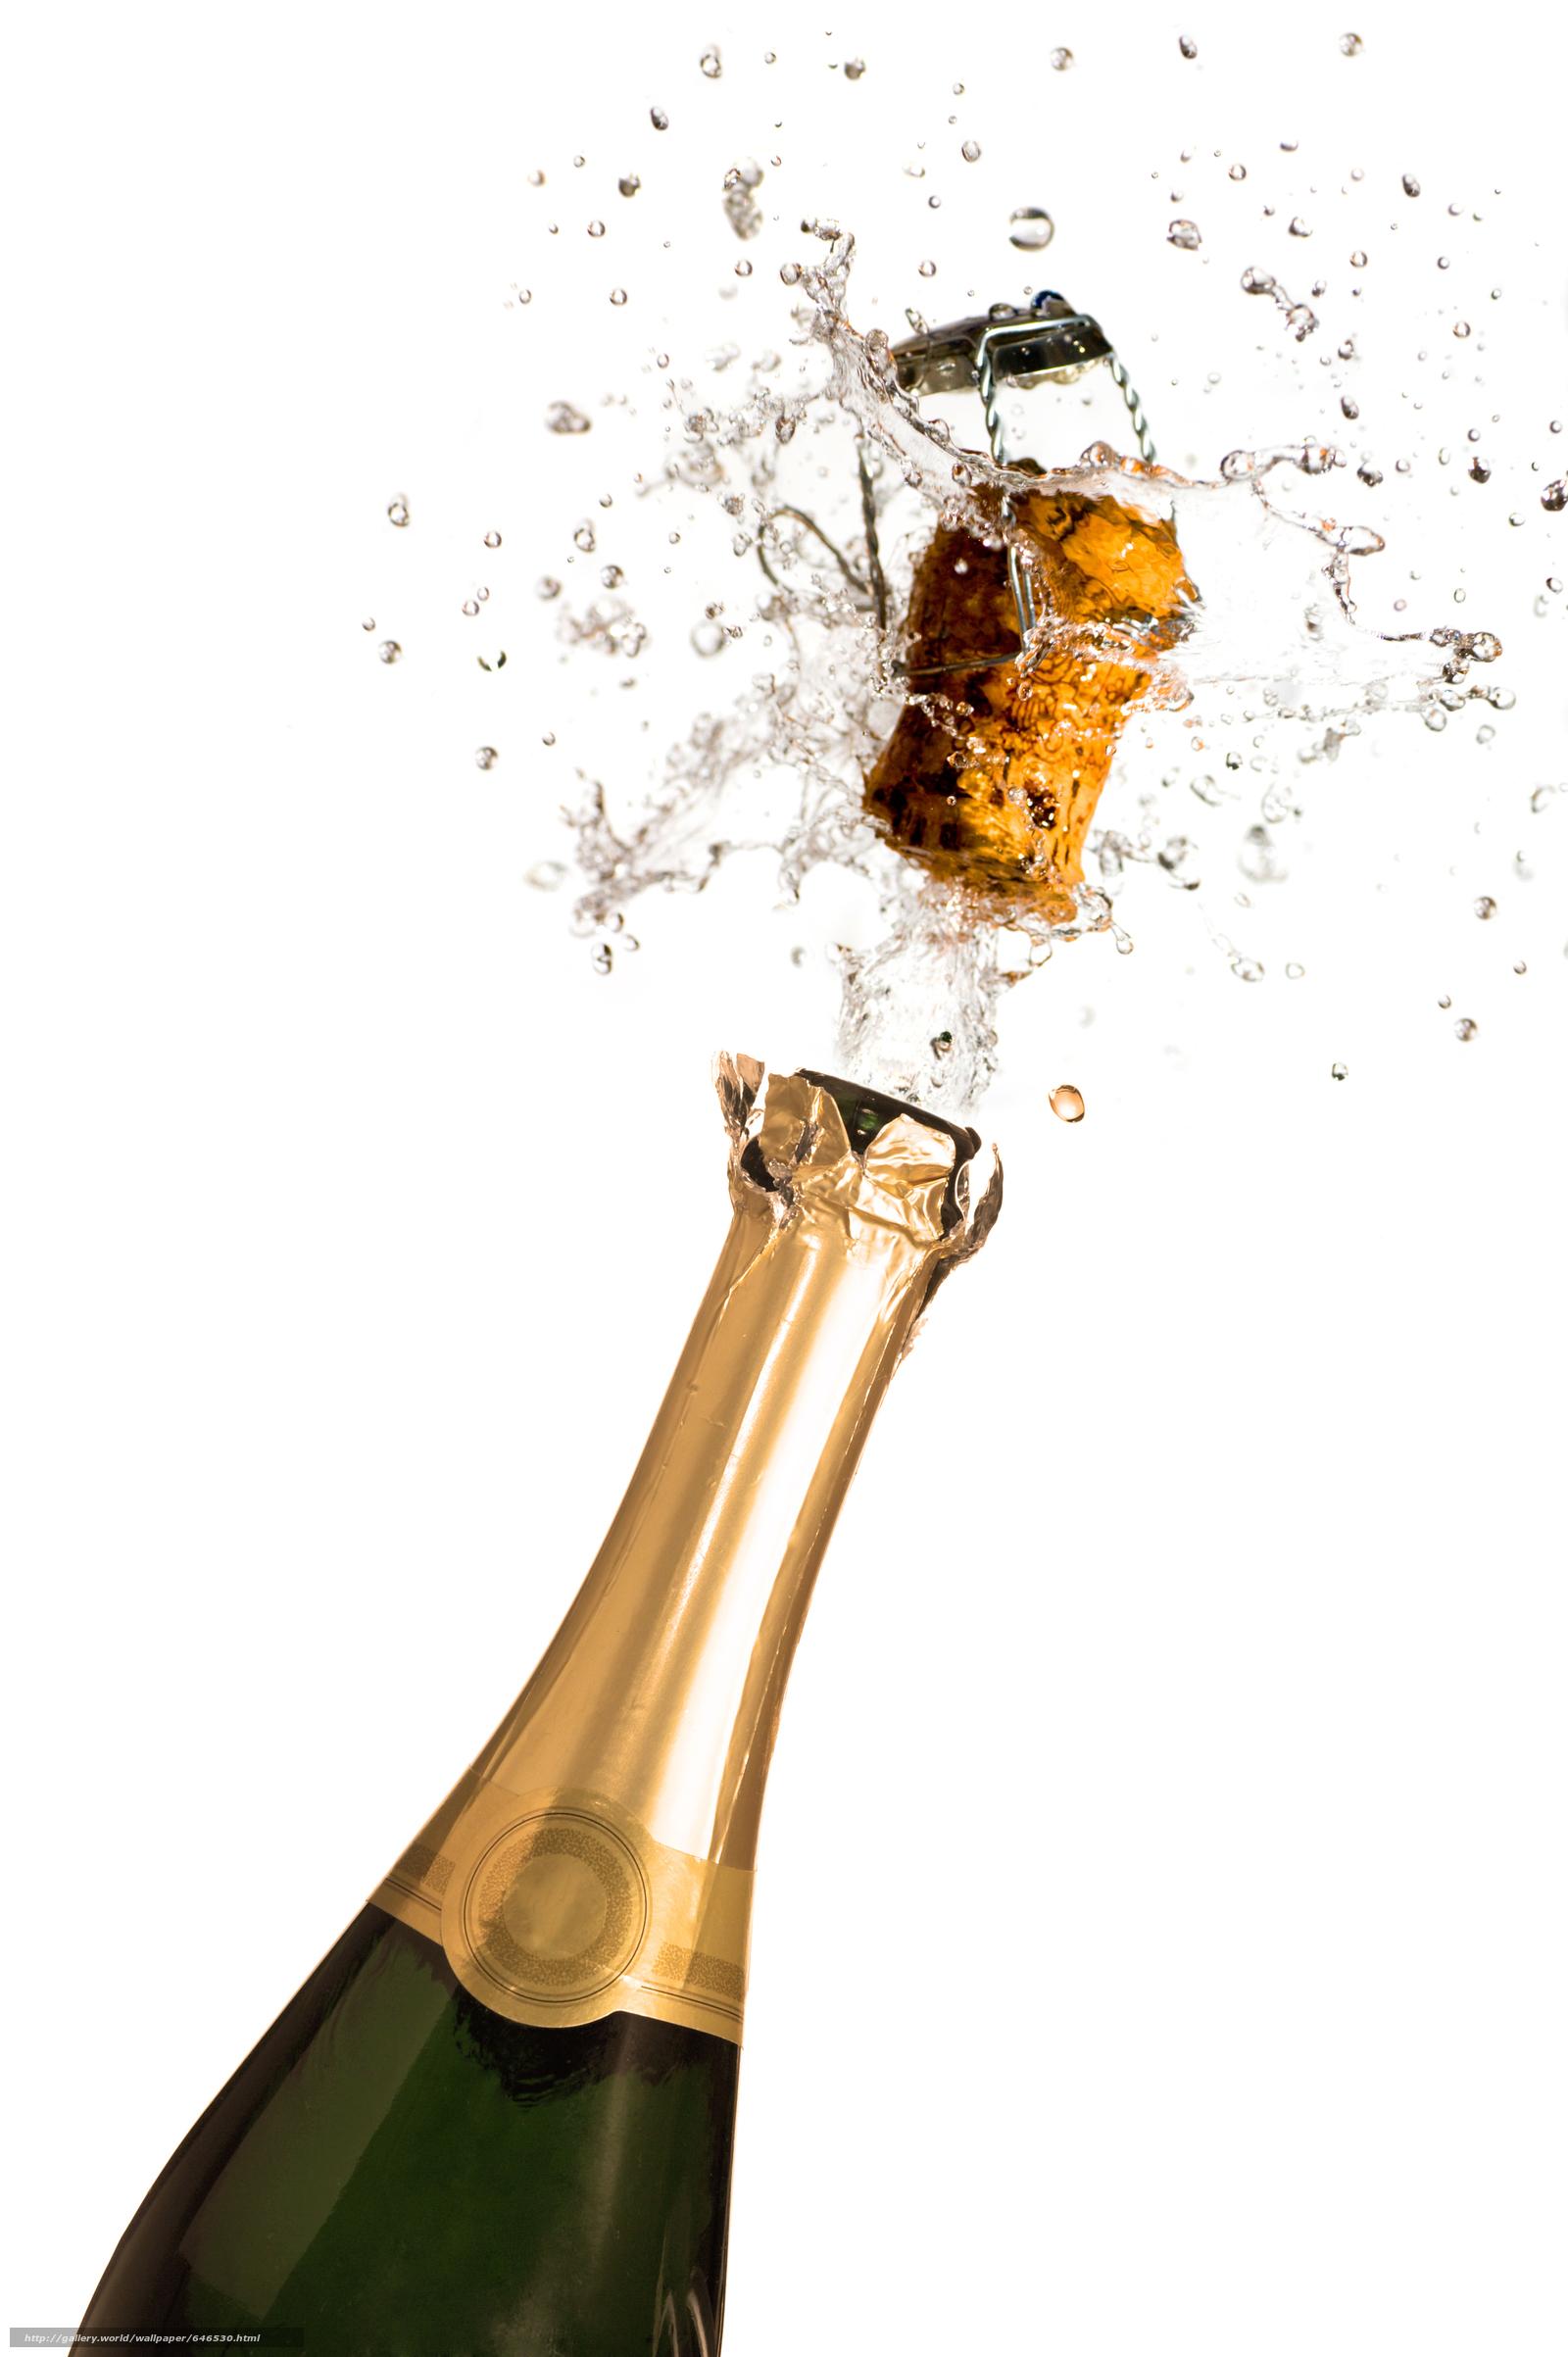 картинки брызги шампанского на прозрачном фоне взгляд